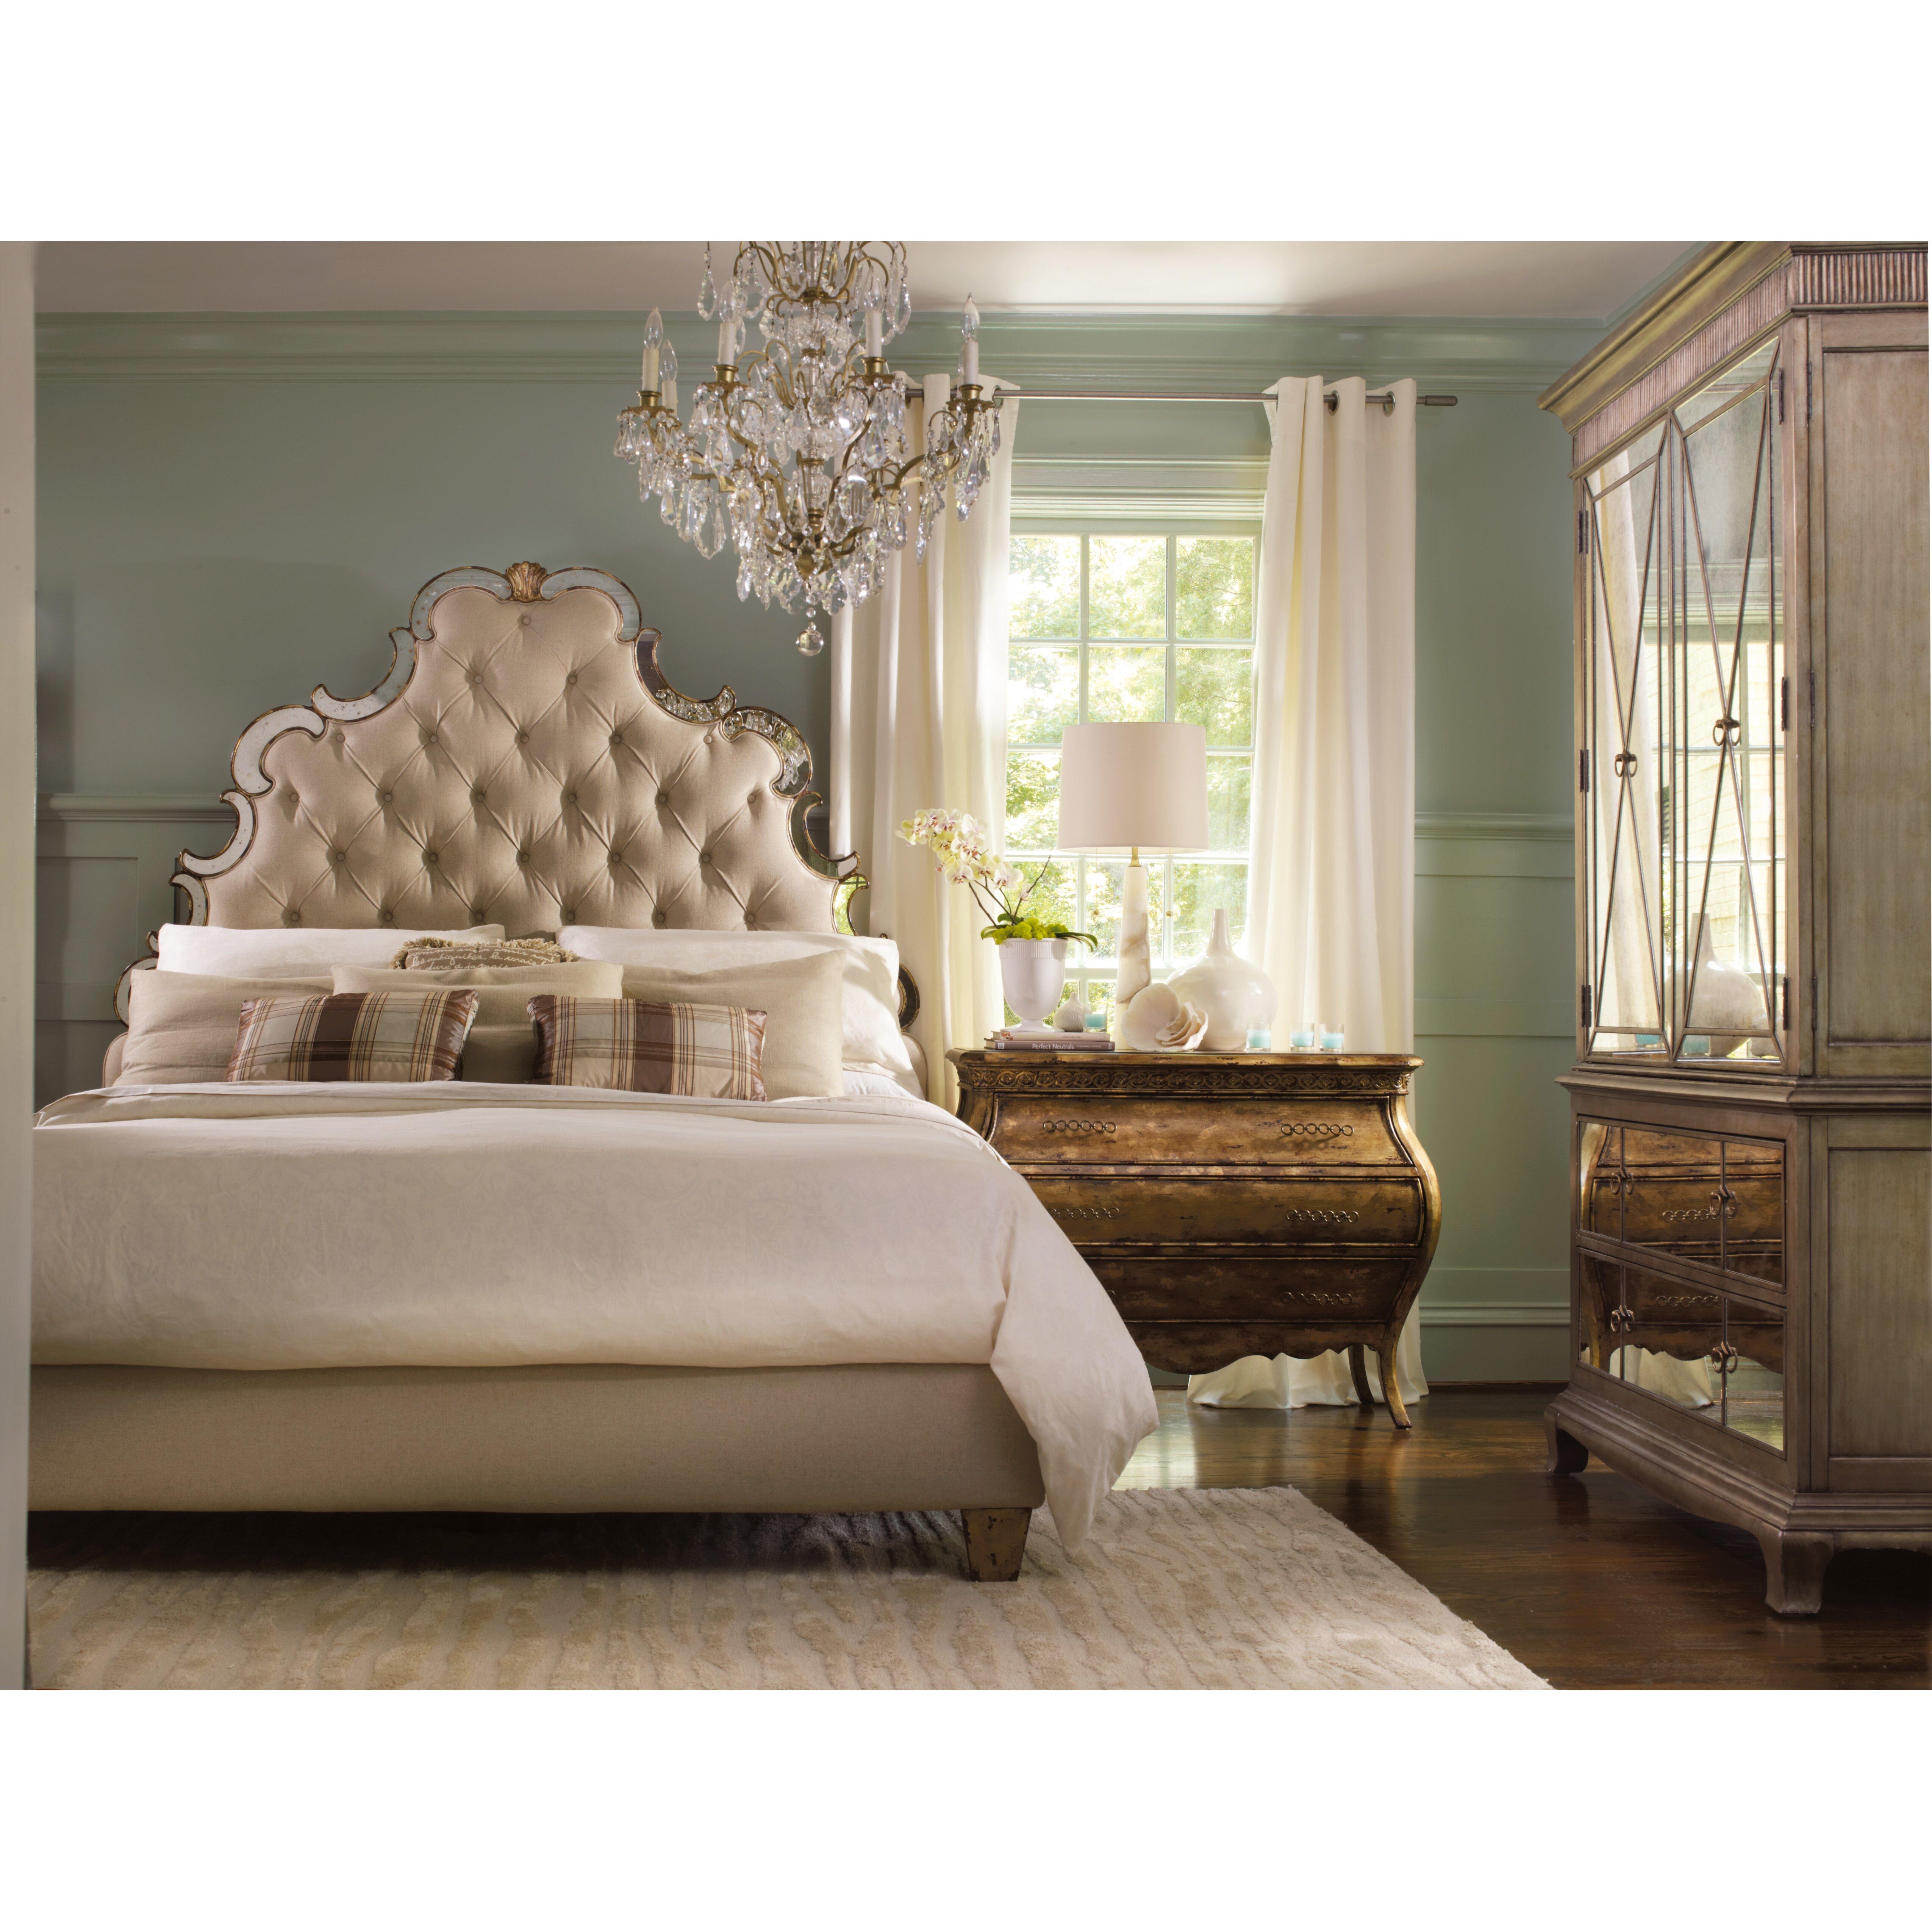 Hooker Furniture Sanctuary Upholstered Headboard Reviews Wayfair